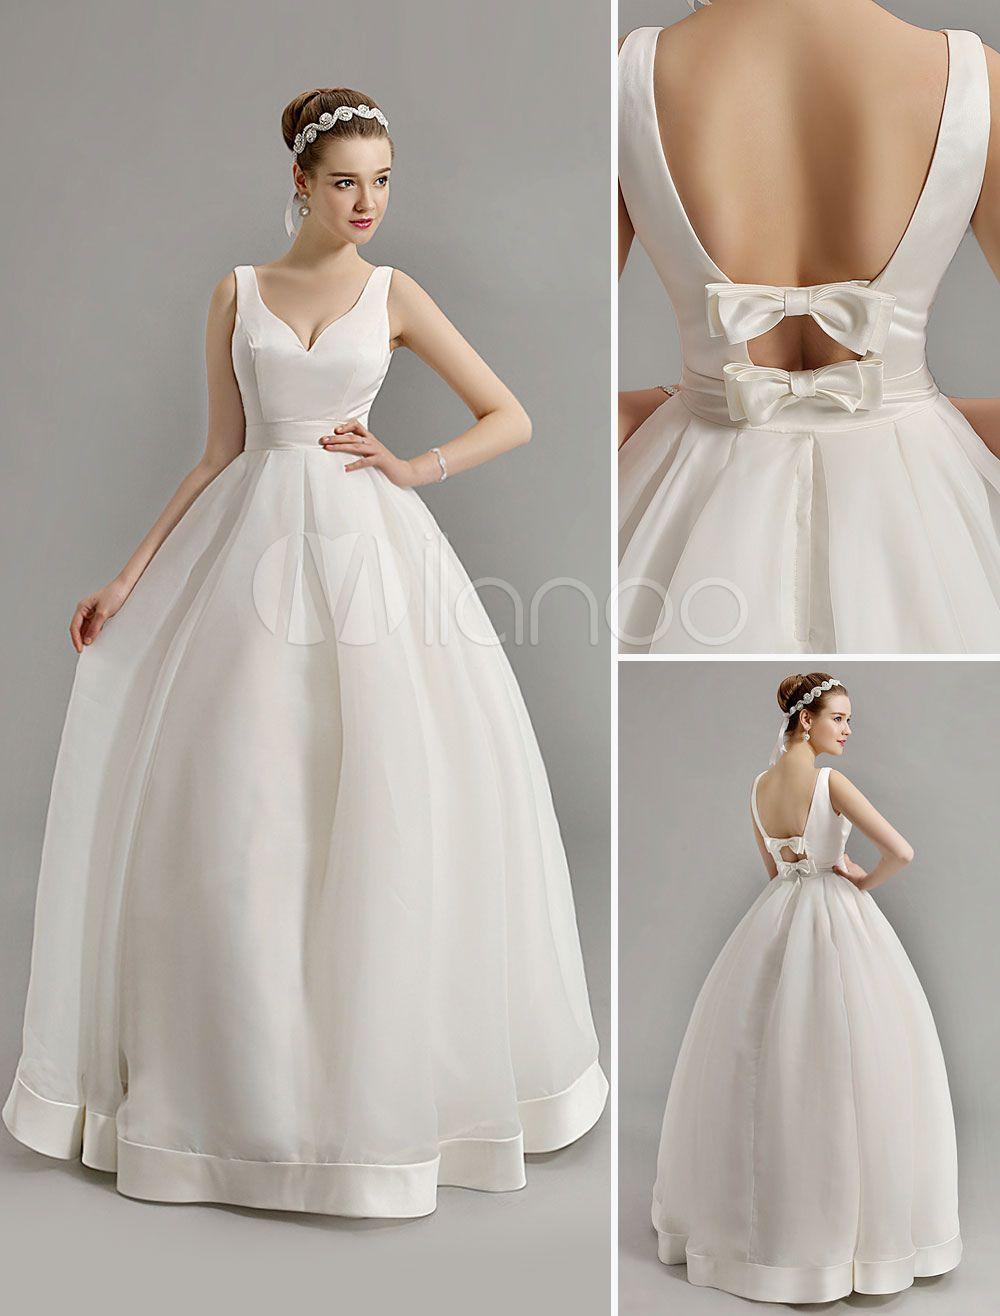 Vintage Inspired Plunge V Neck Wedding Gown with Bow Embellished Cut ...